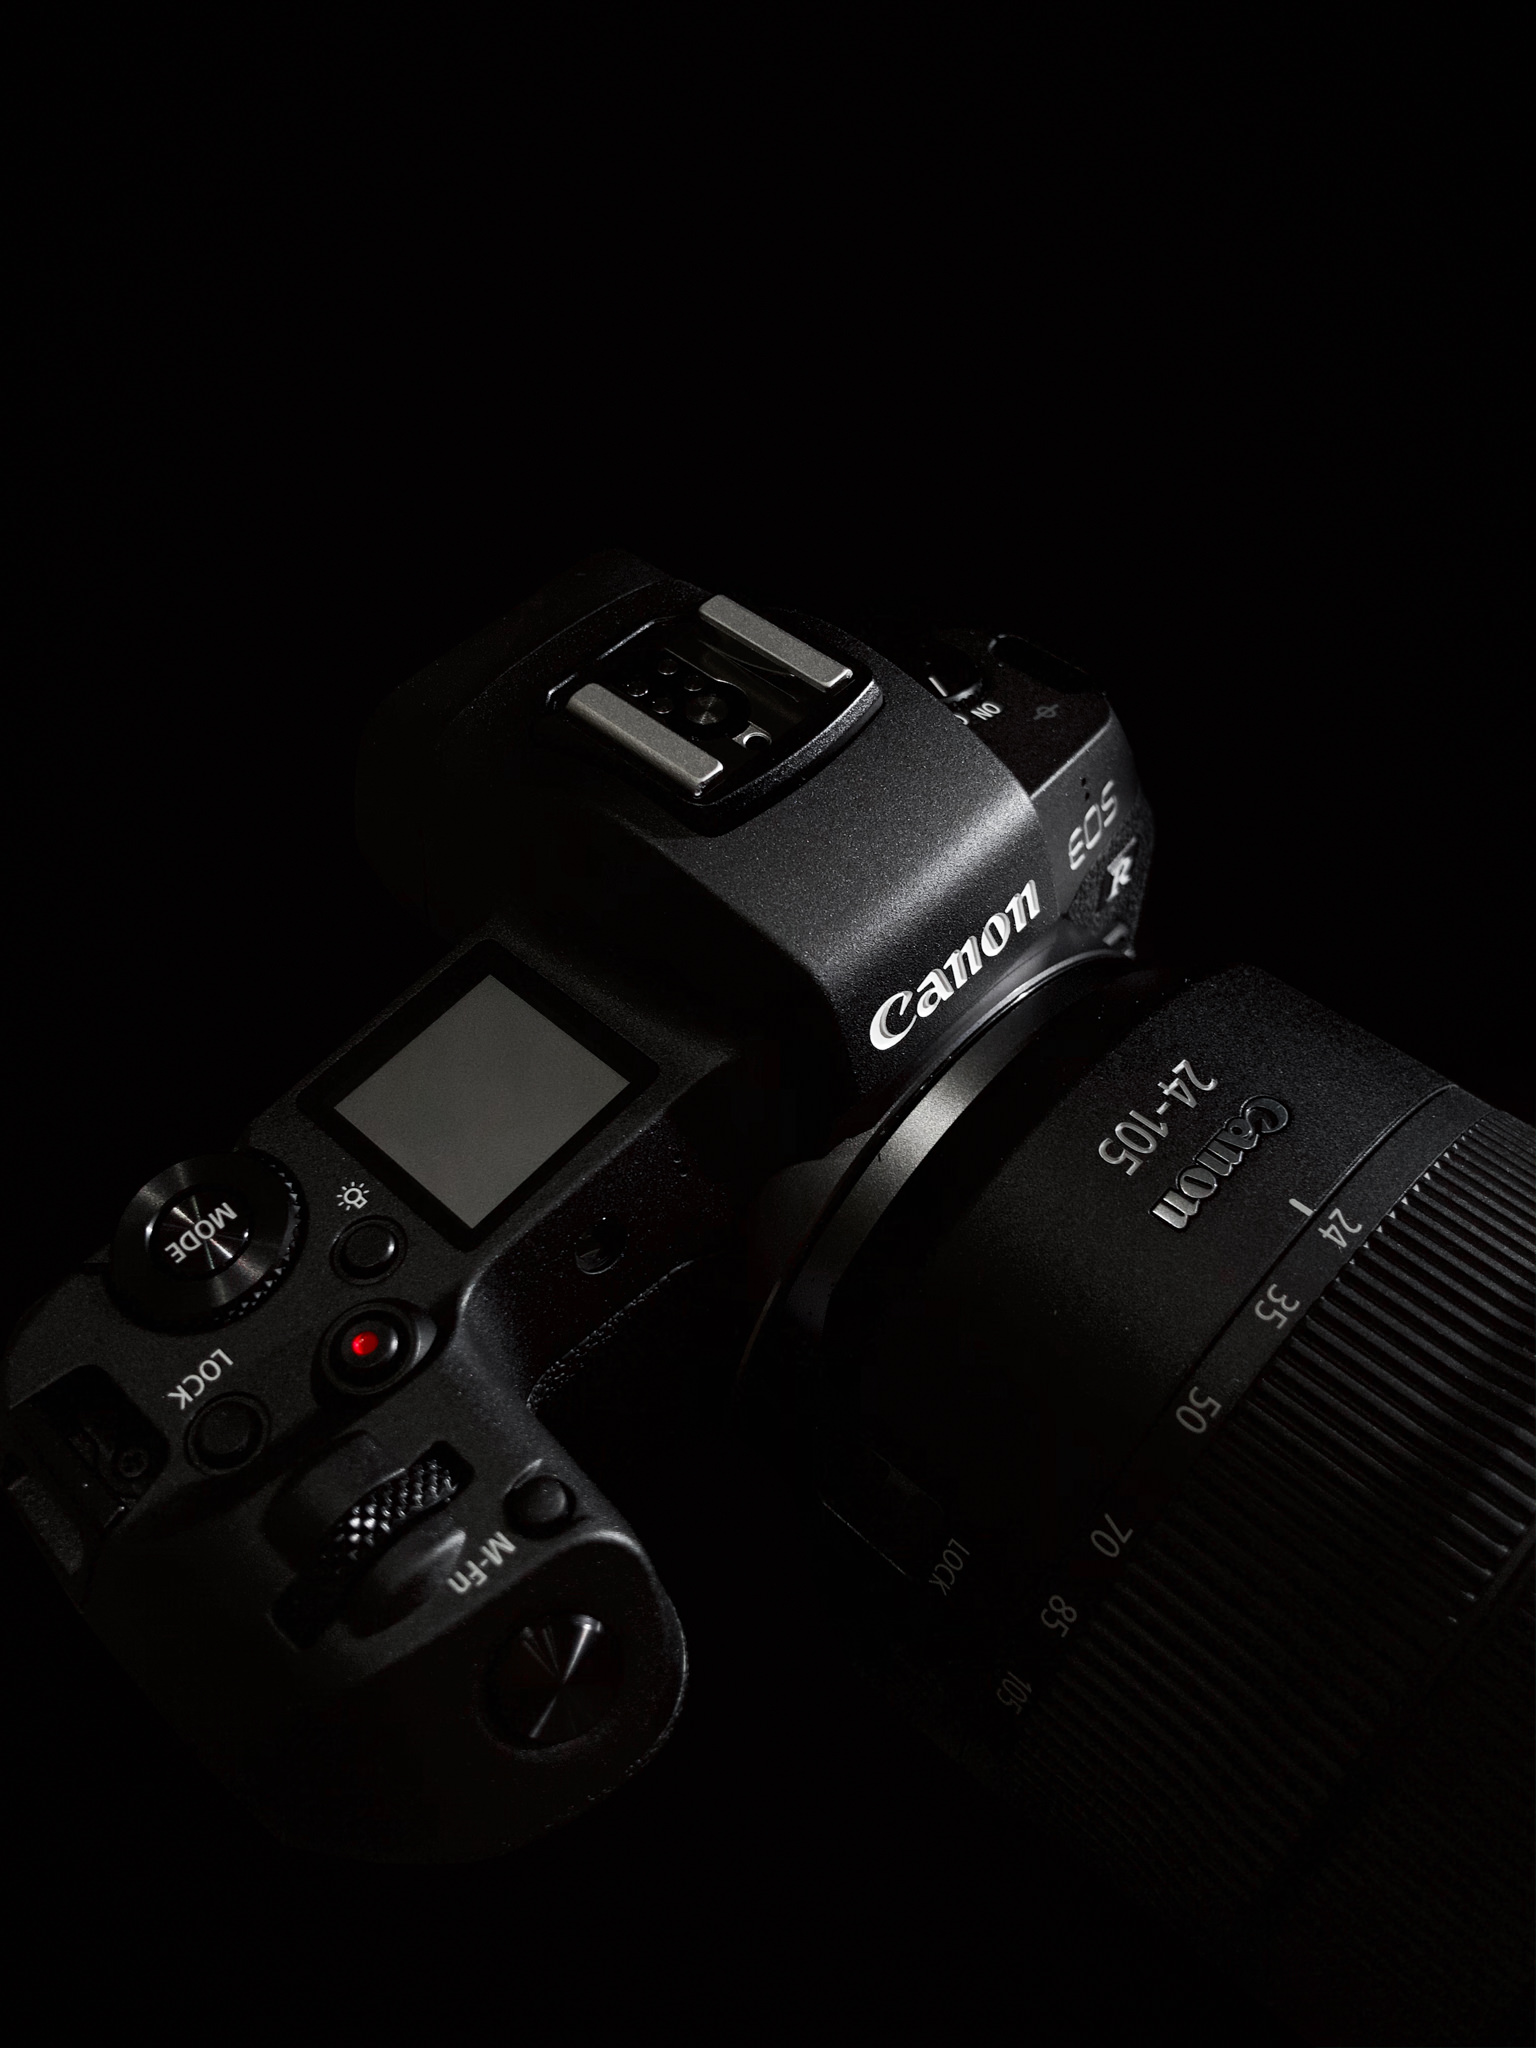 fotostuudio-lumiere-Rene-türk-canon-eosr-photopoint_2